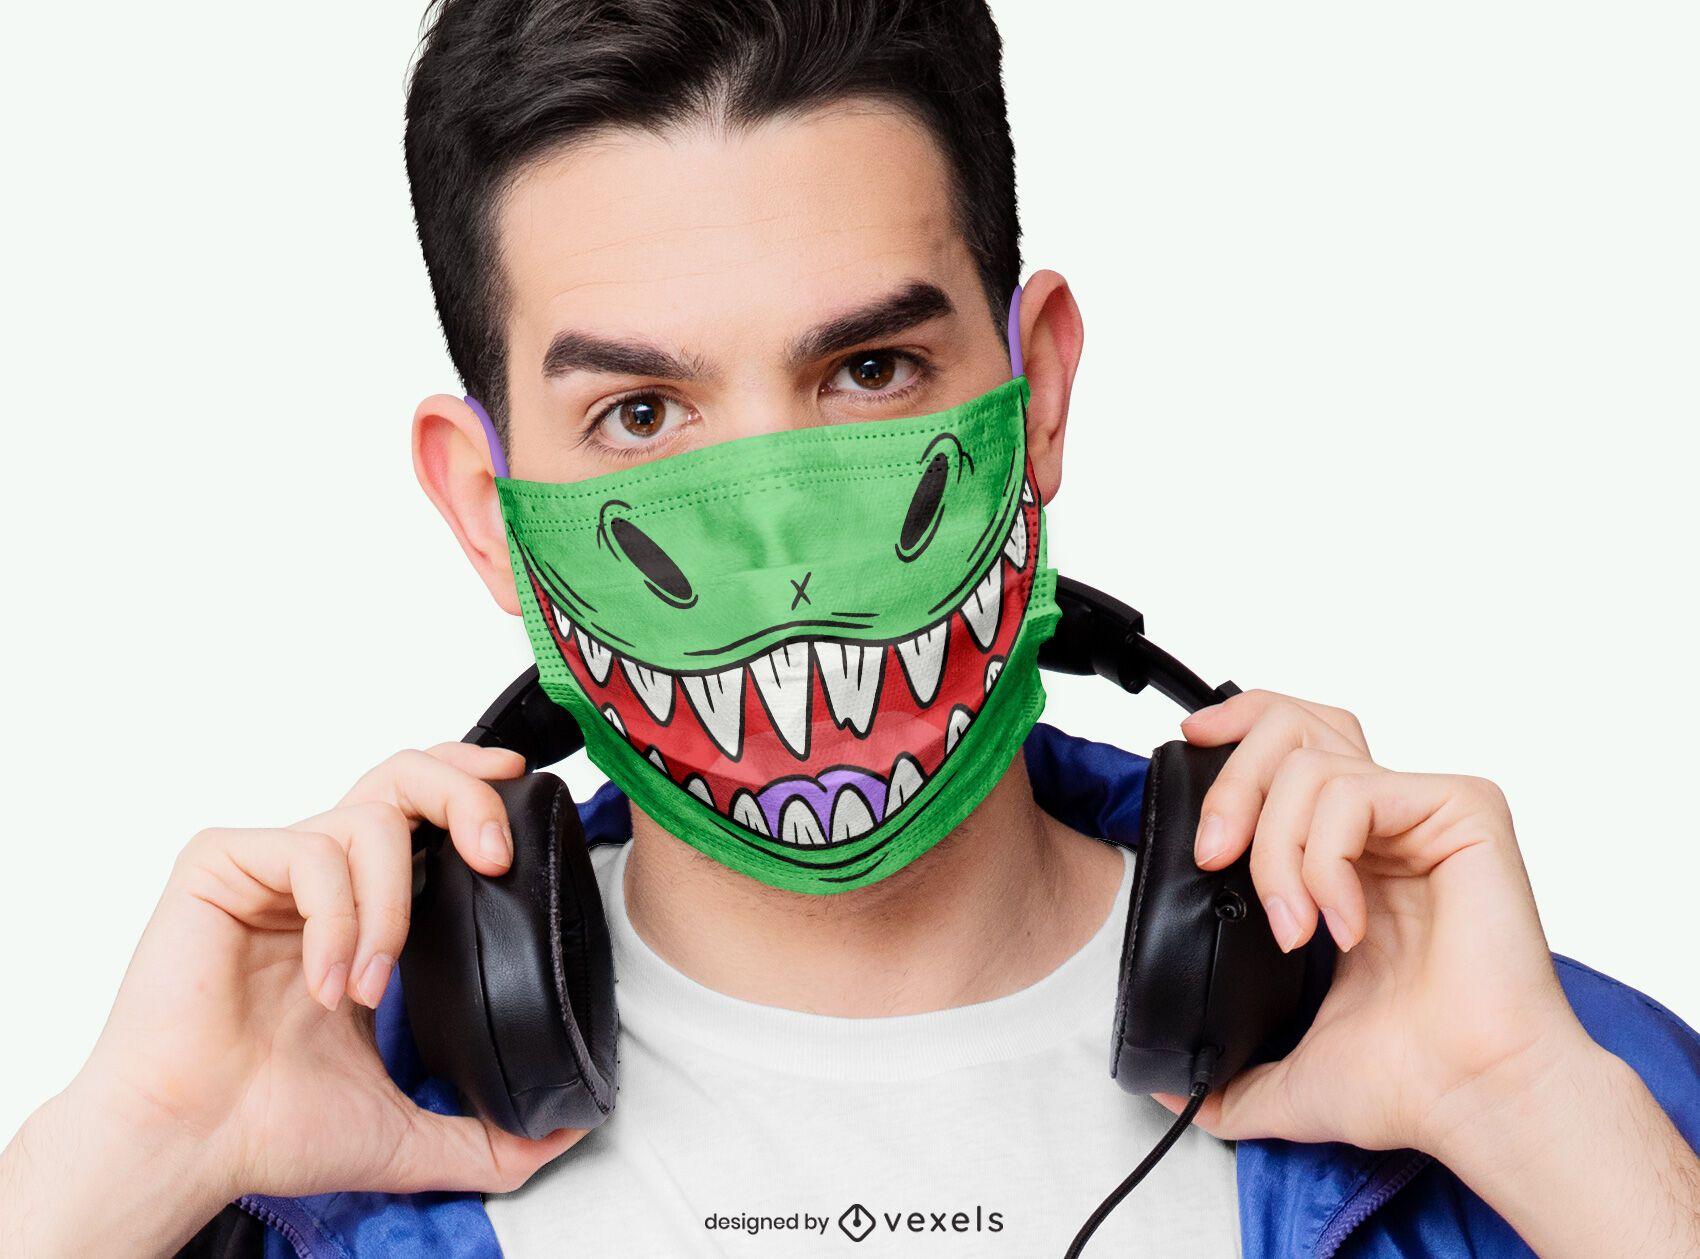 Dinosaur mouth face mask design